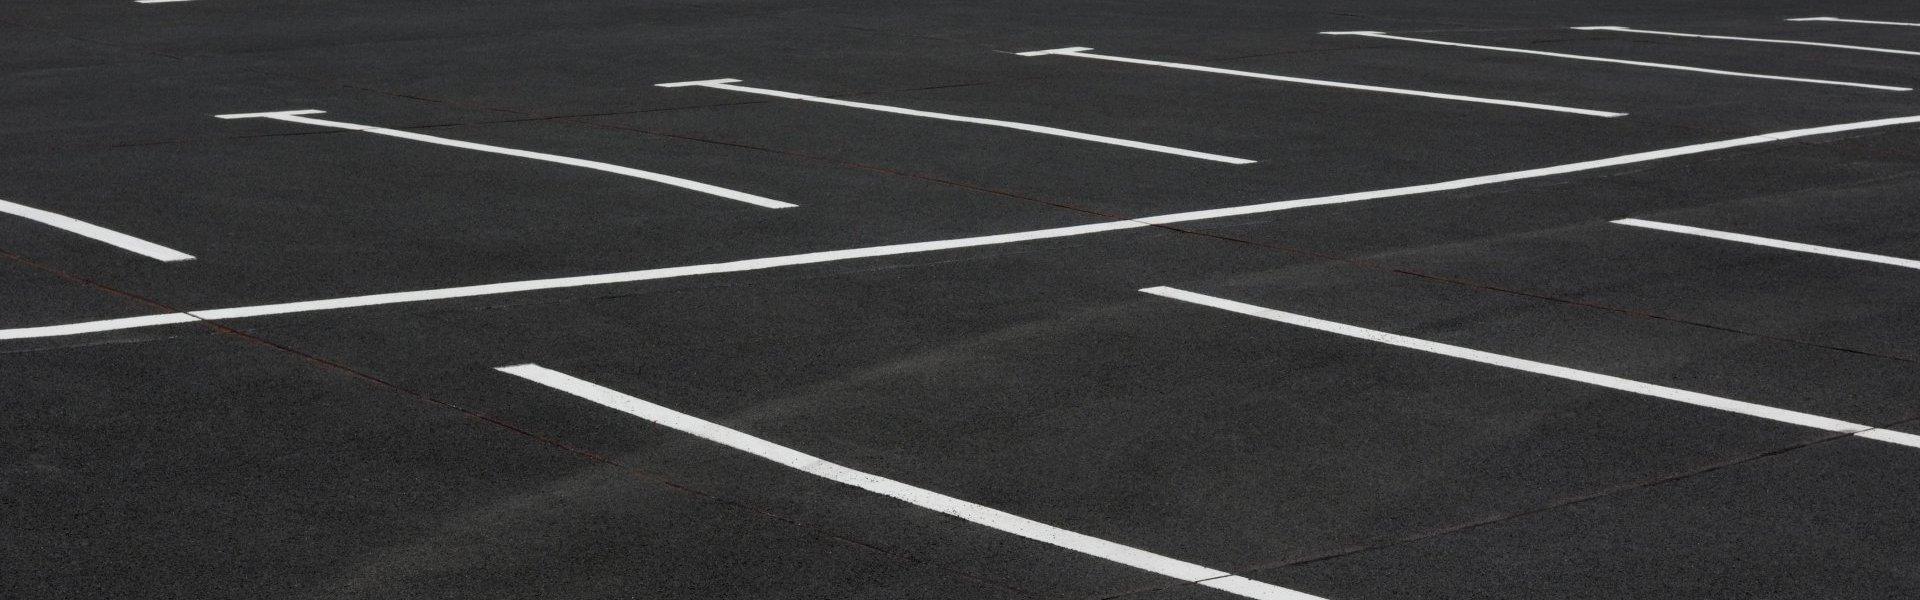 car-park-line-markings